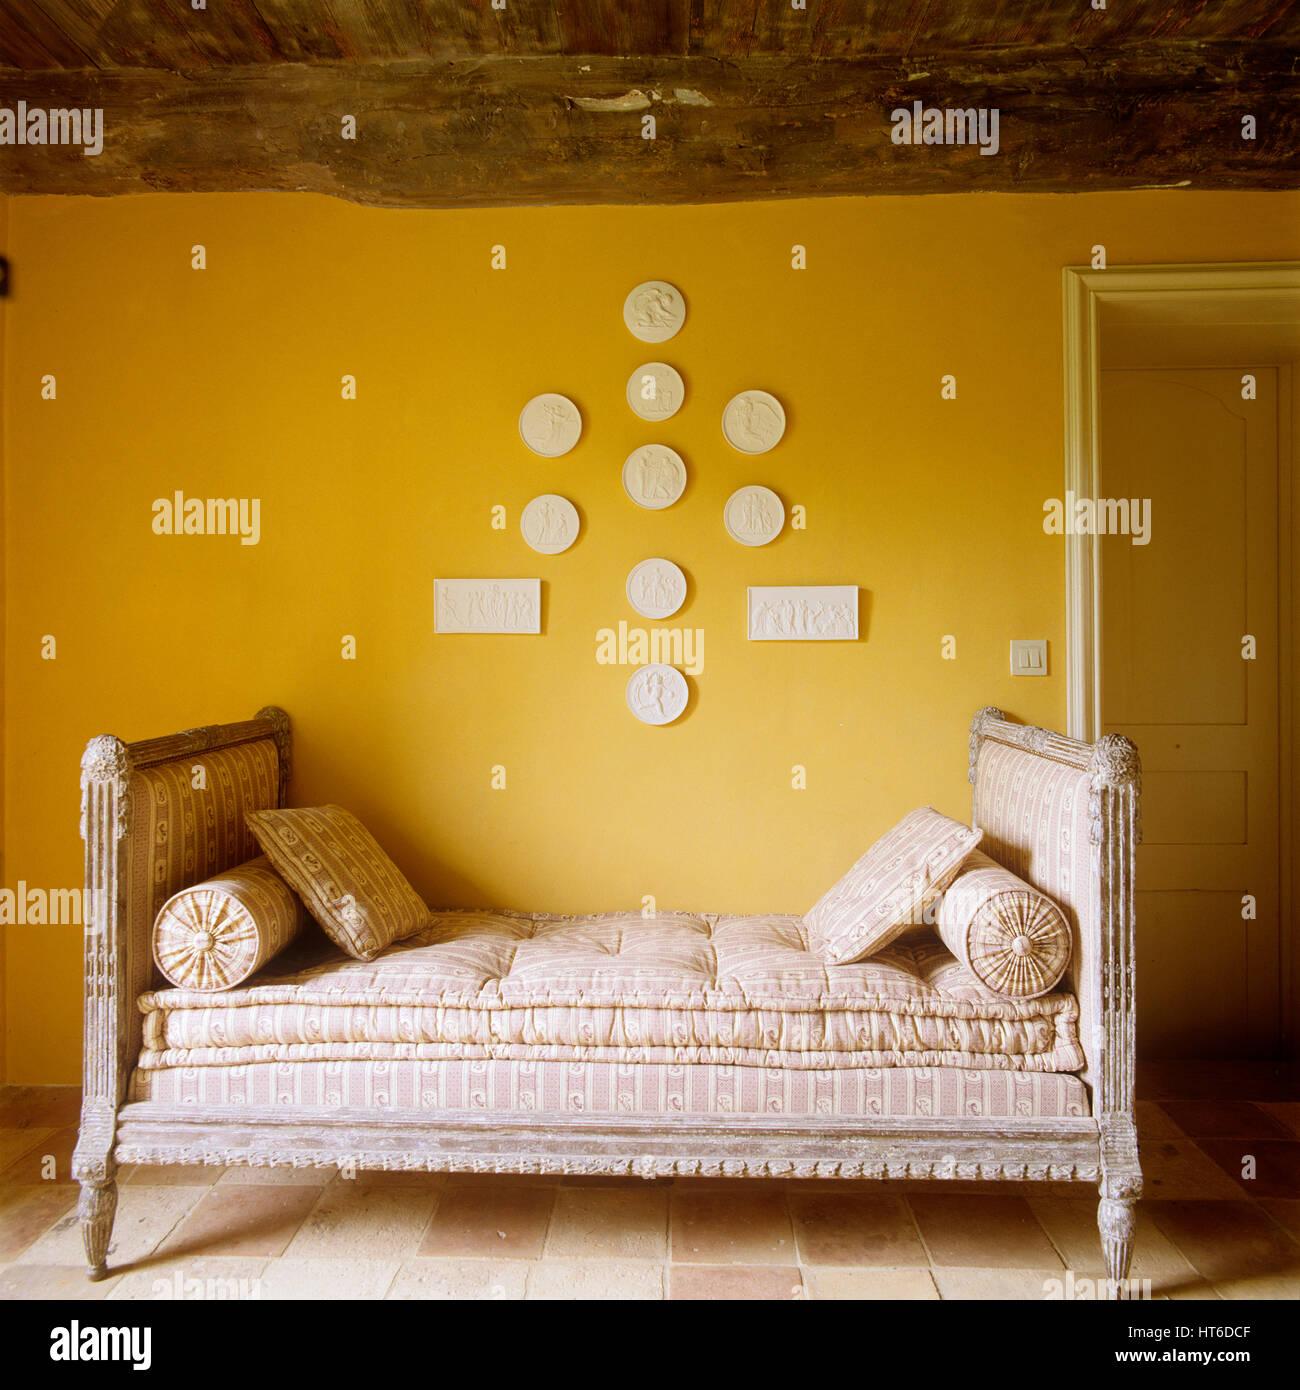 Pastel Yellow Walls Stock Photos & Pastel Yellow Walls Stock Images ...